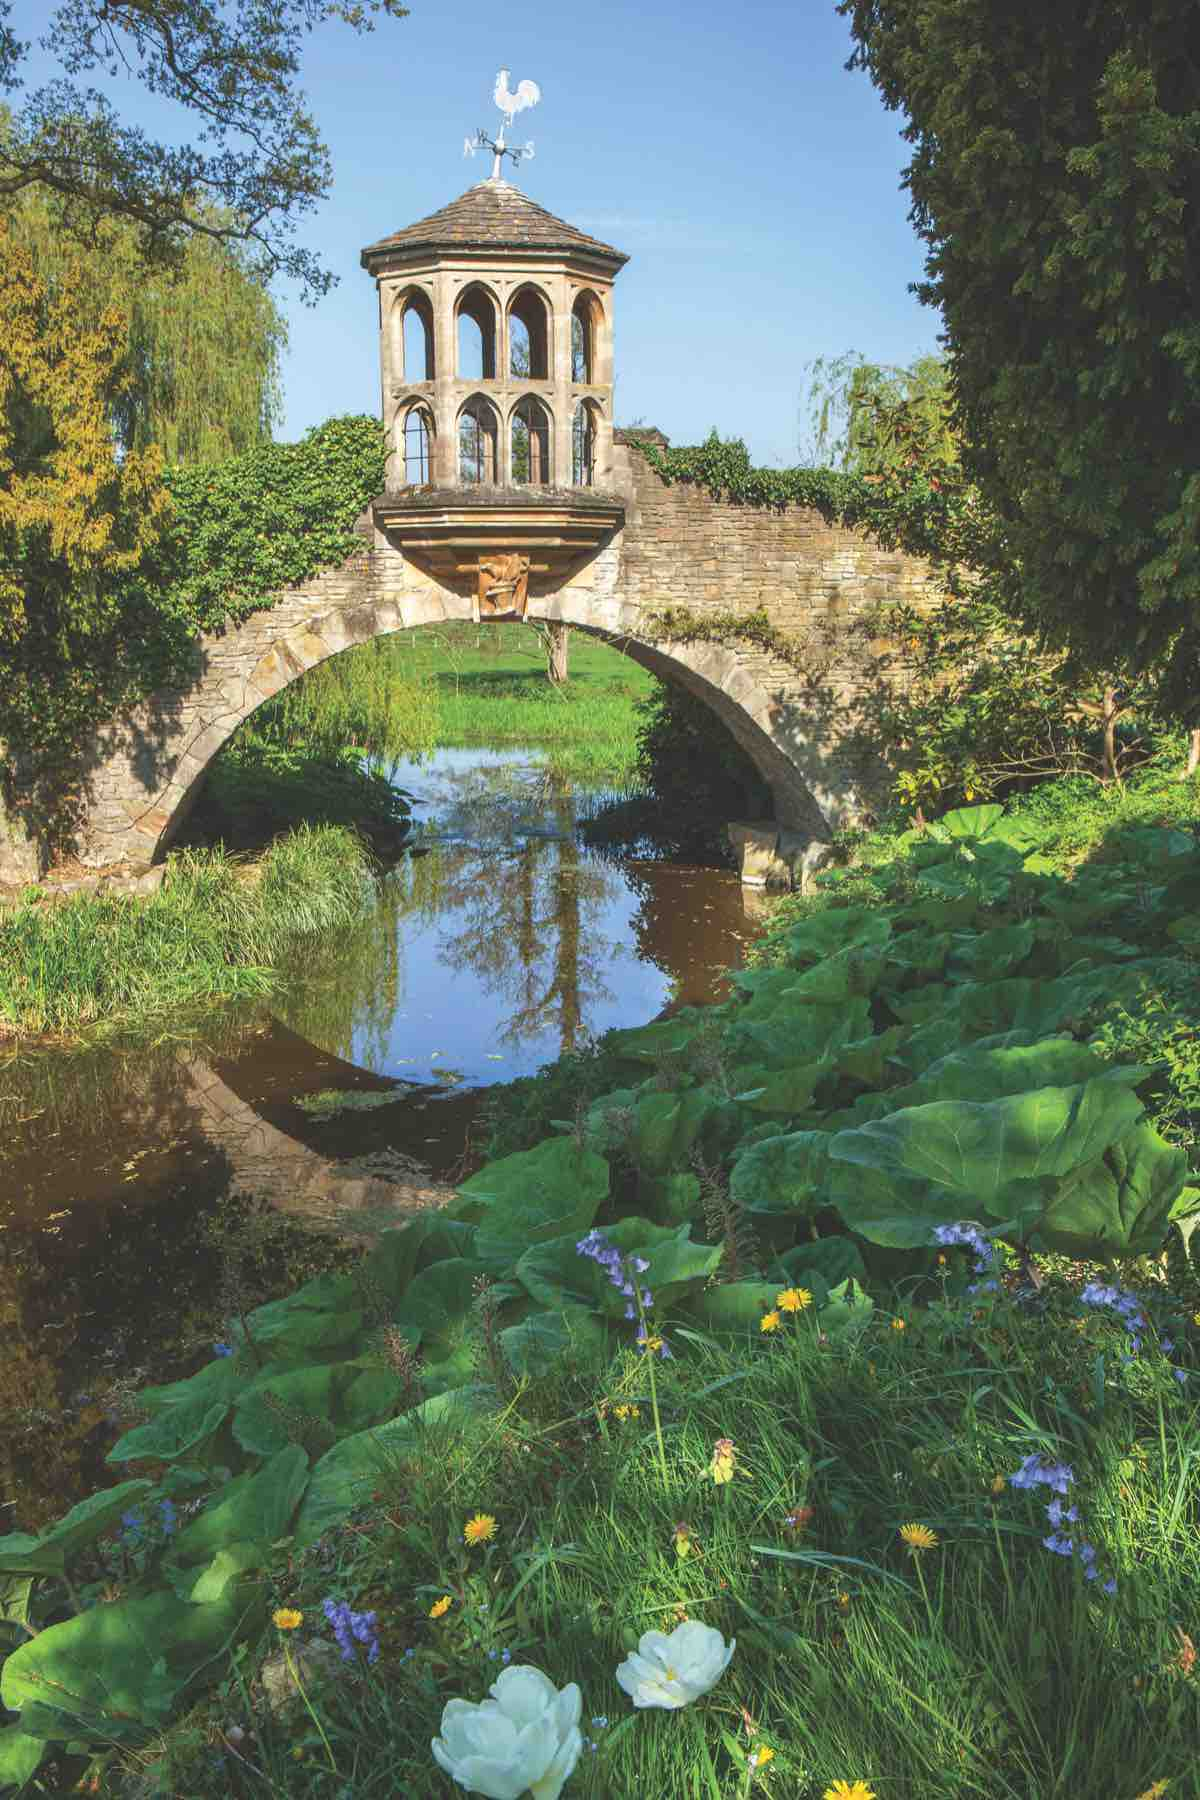 Folly on stone bridge over stream